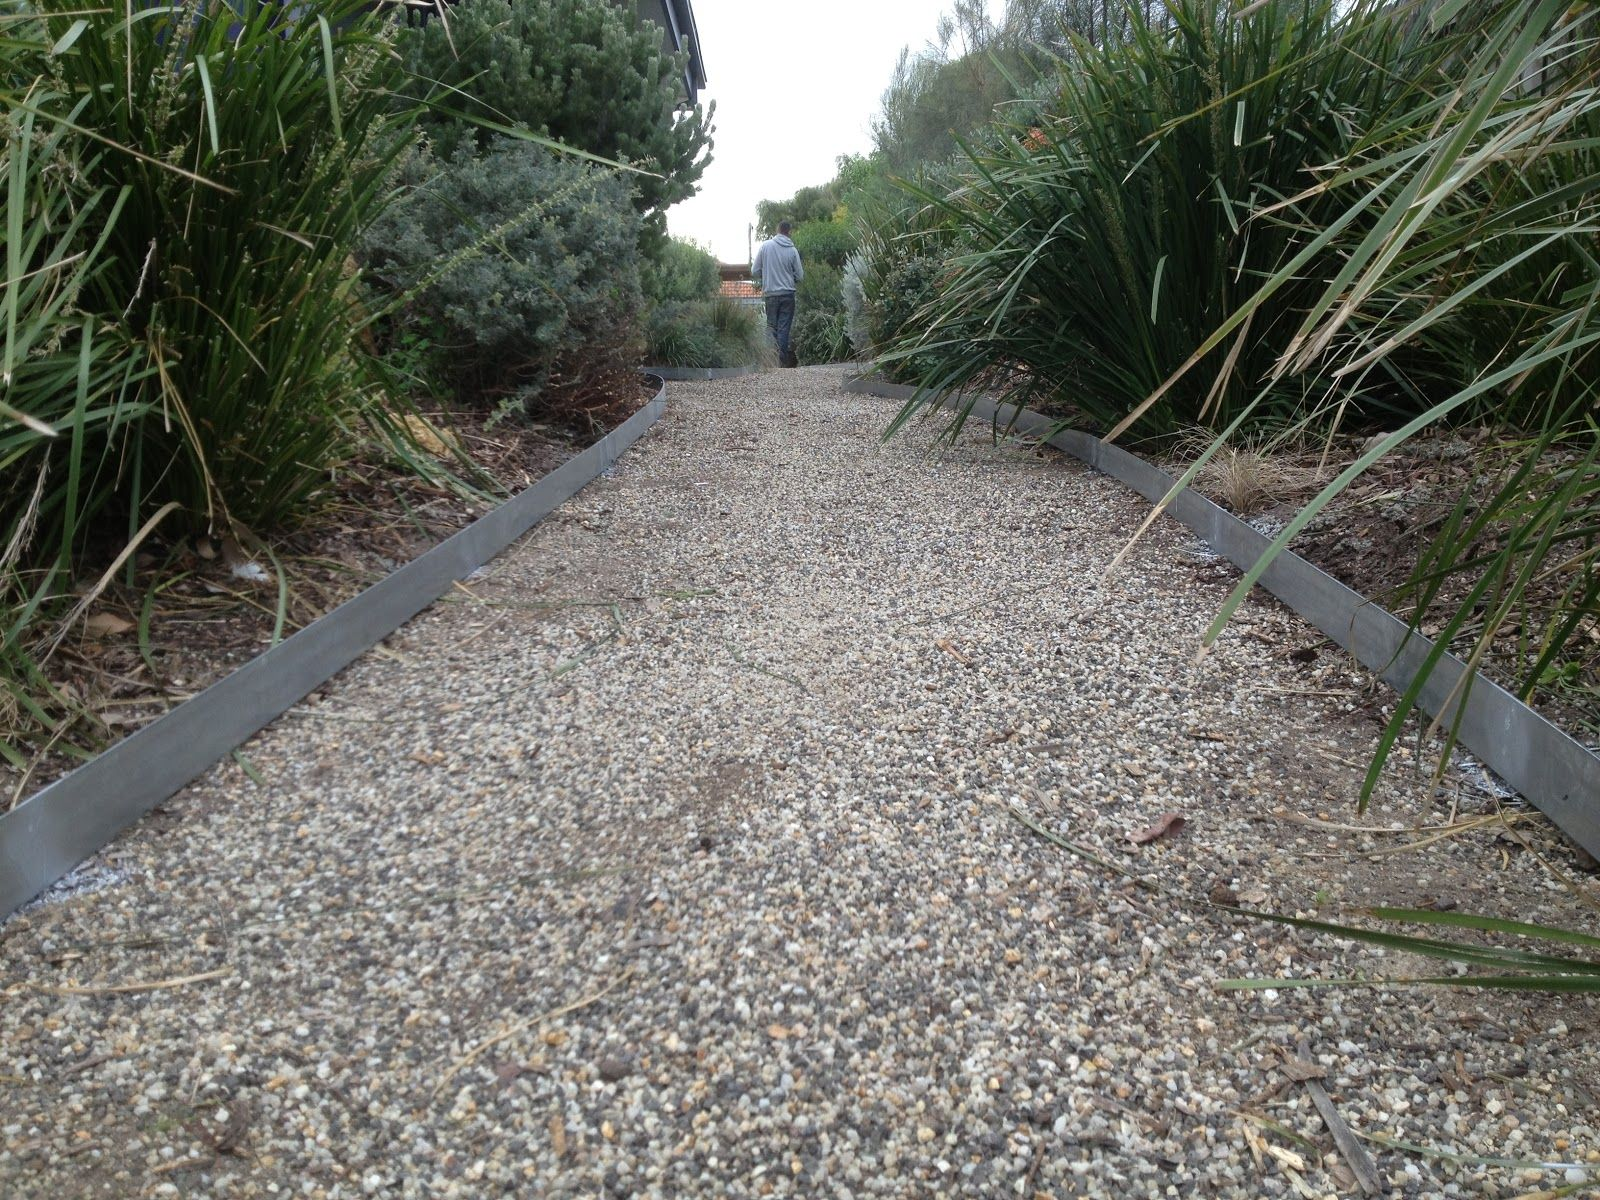 Superieur Galvanised Steel Garden Edging, Low Maintenance Long Lasting.